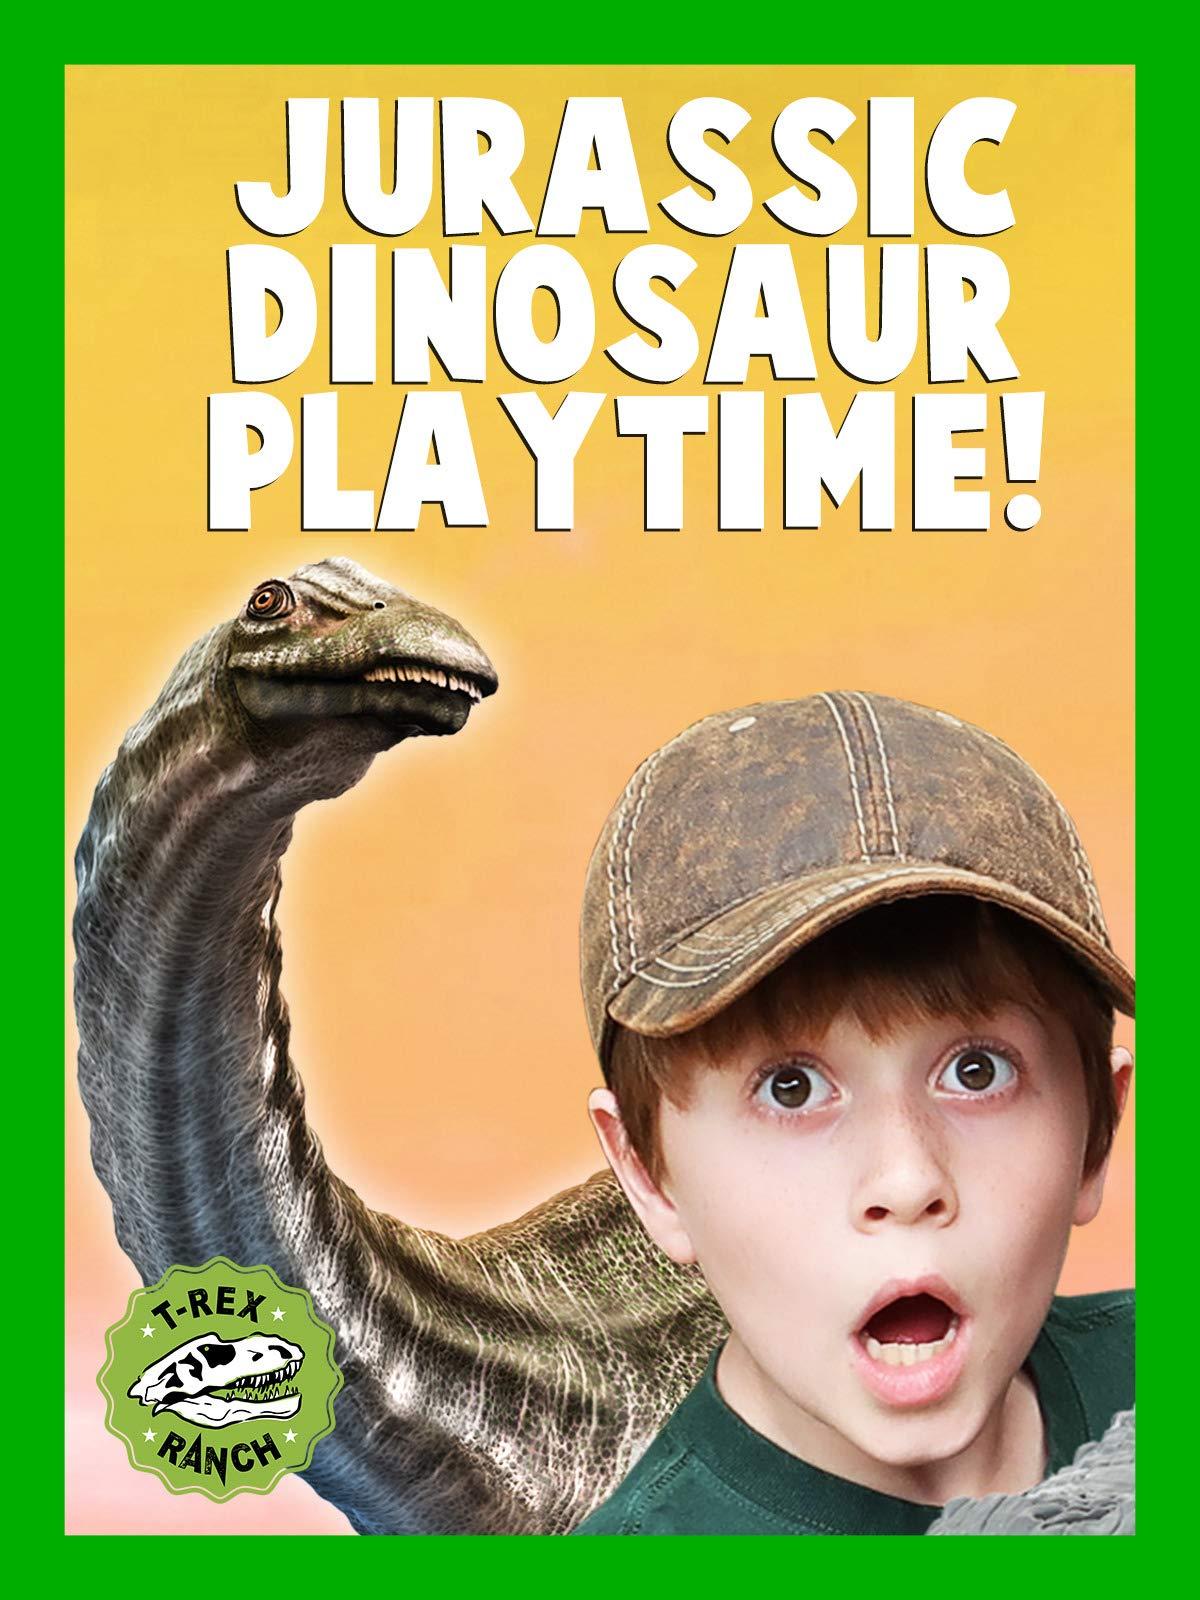 Jurassic Dinosaur playtime! T-Rex Ranch